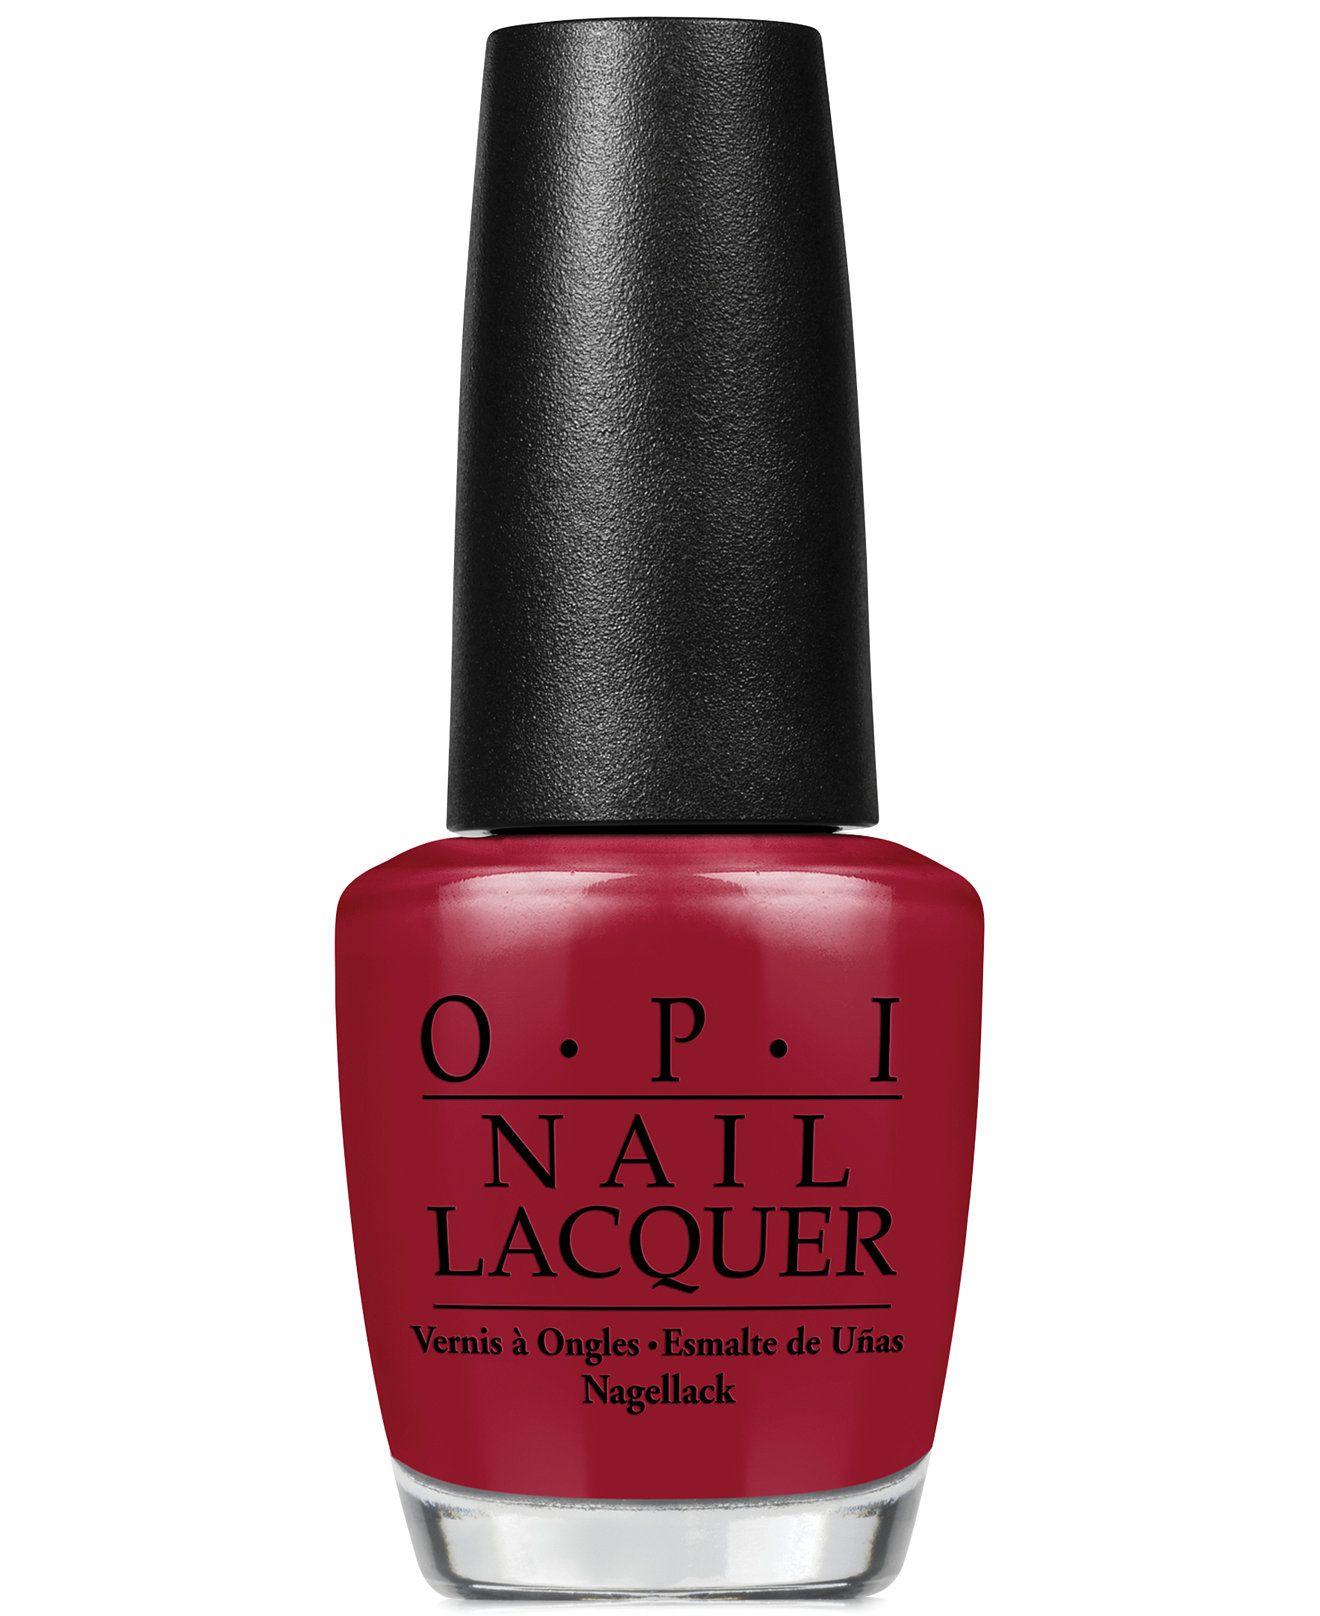 OPI Nail Lacquer, Malaga Wine - Makeup - Beauty - Macy's